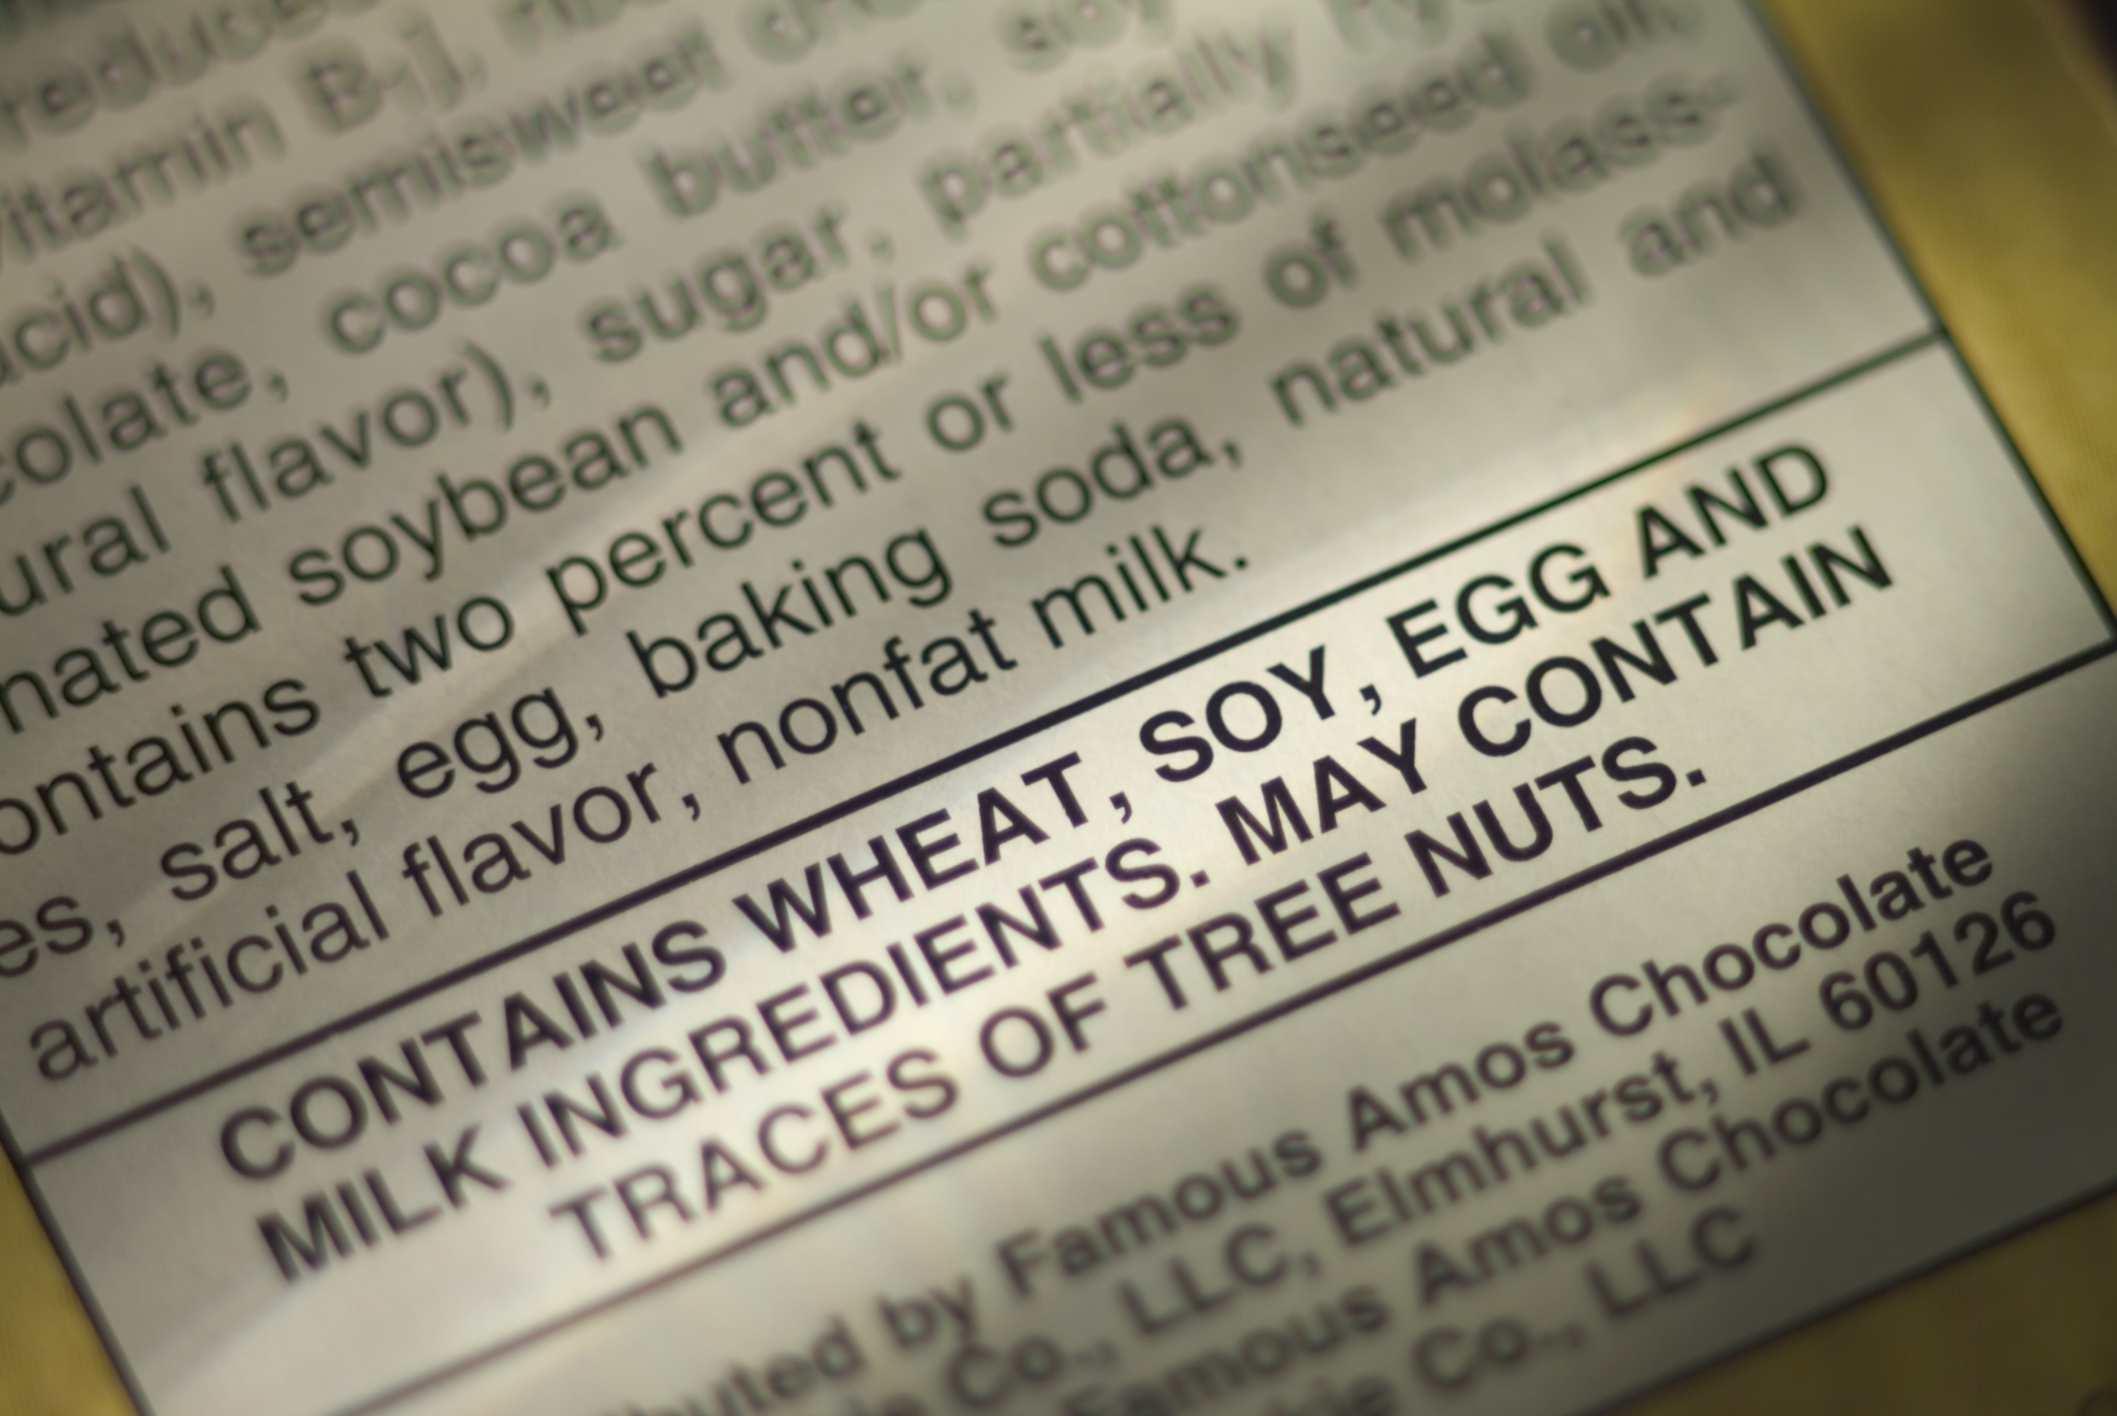 etiqueta de alimentos con advertencia de trigo